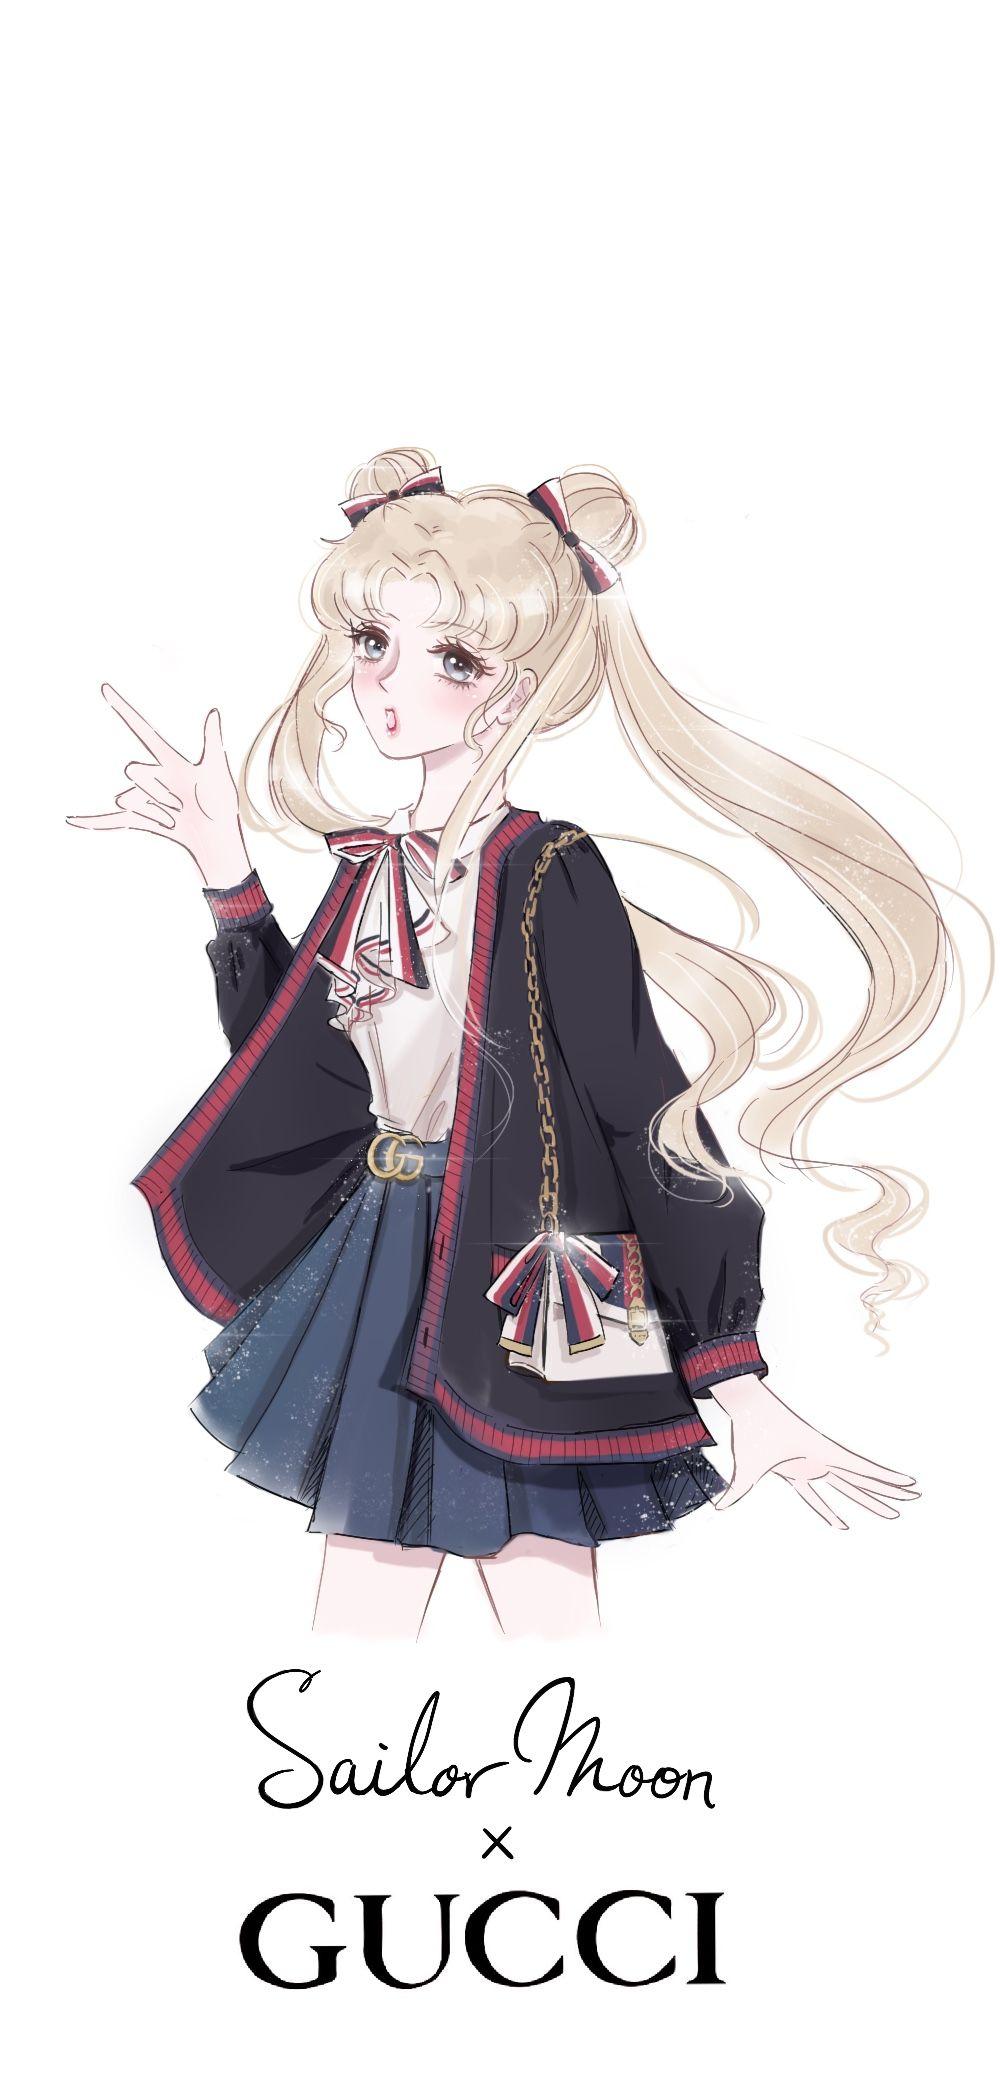 Sailormoon Gucci Drawings Anime Sailor Moon Wallpaper Sailor